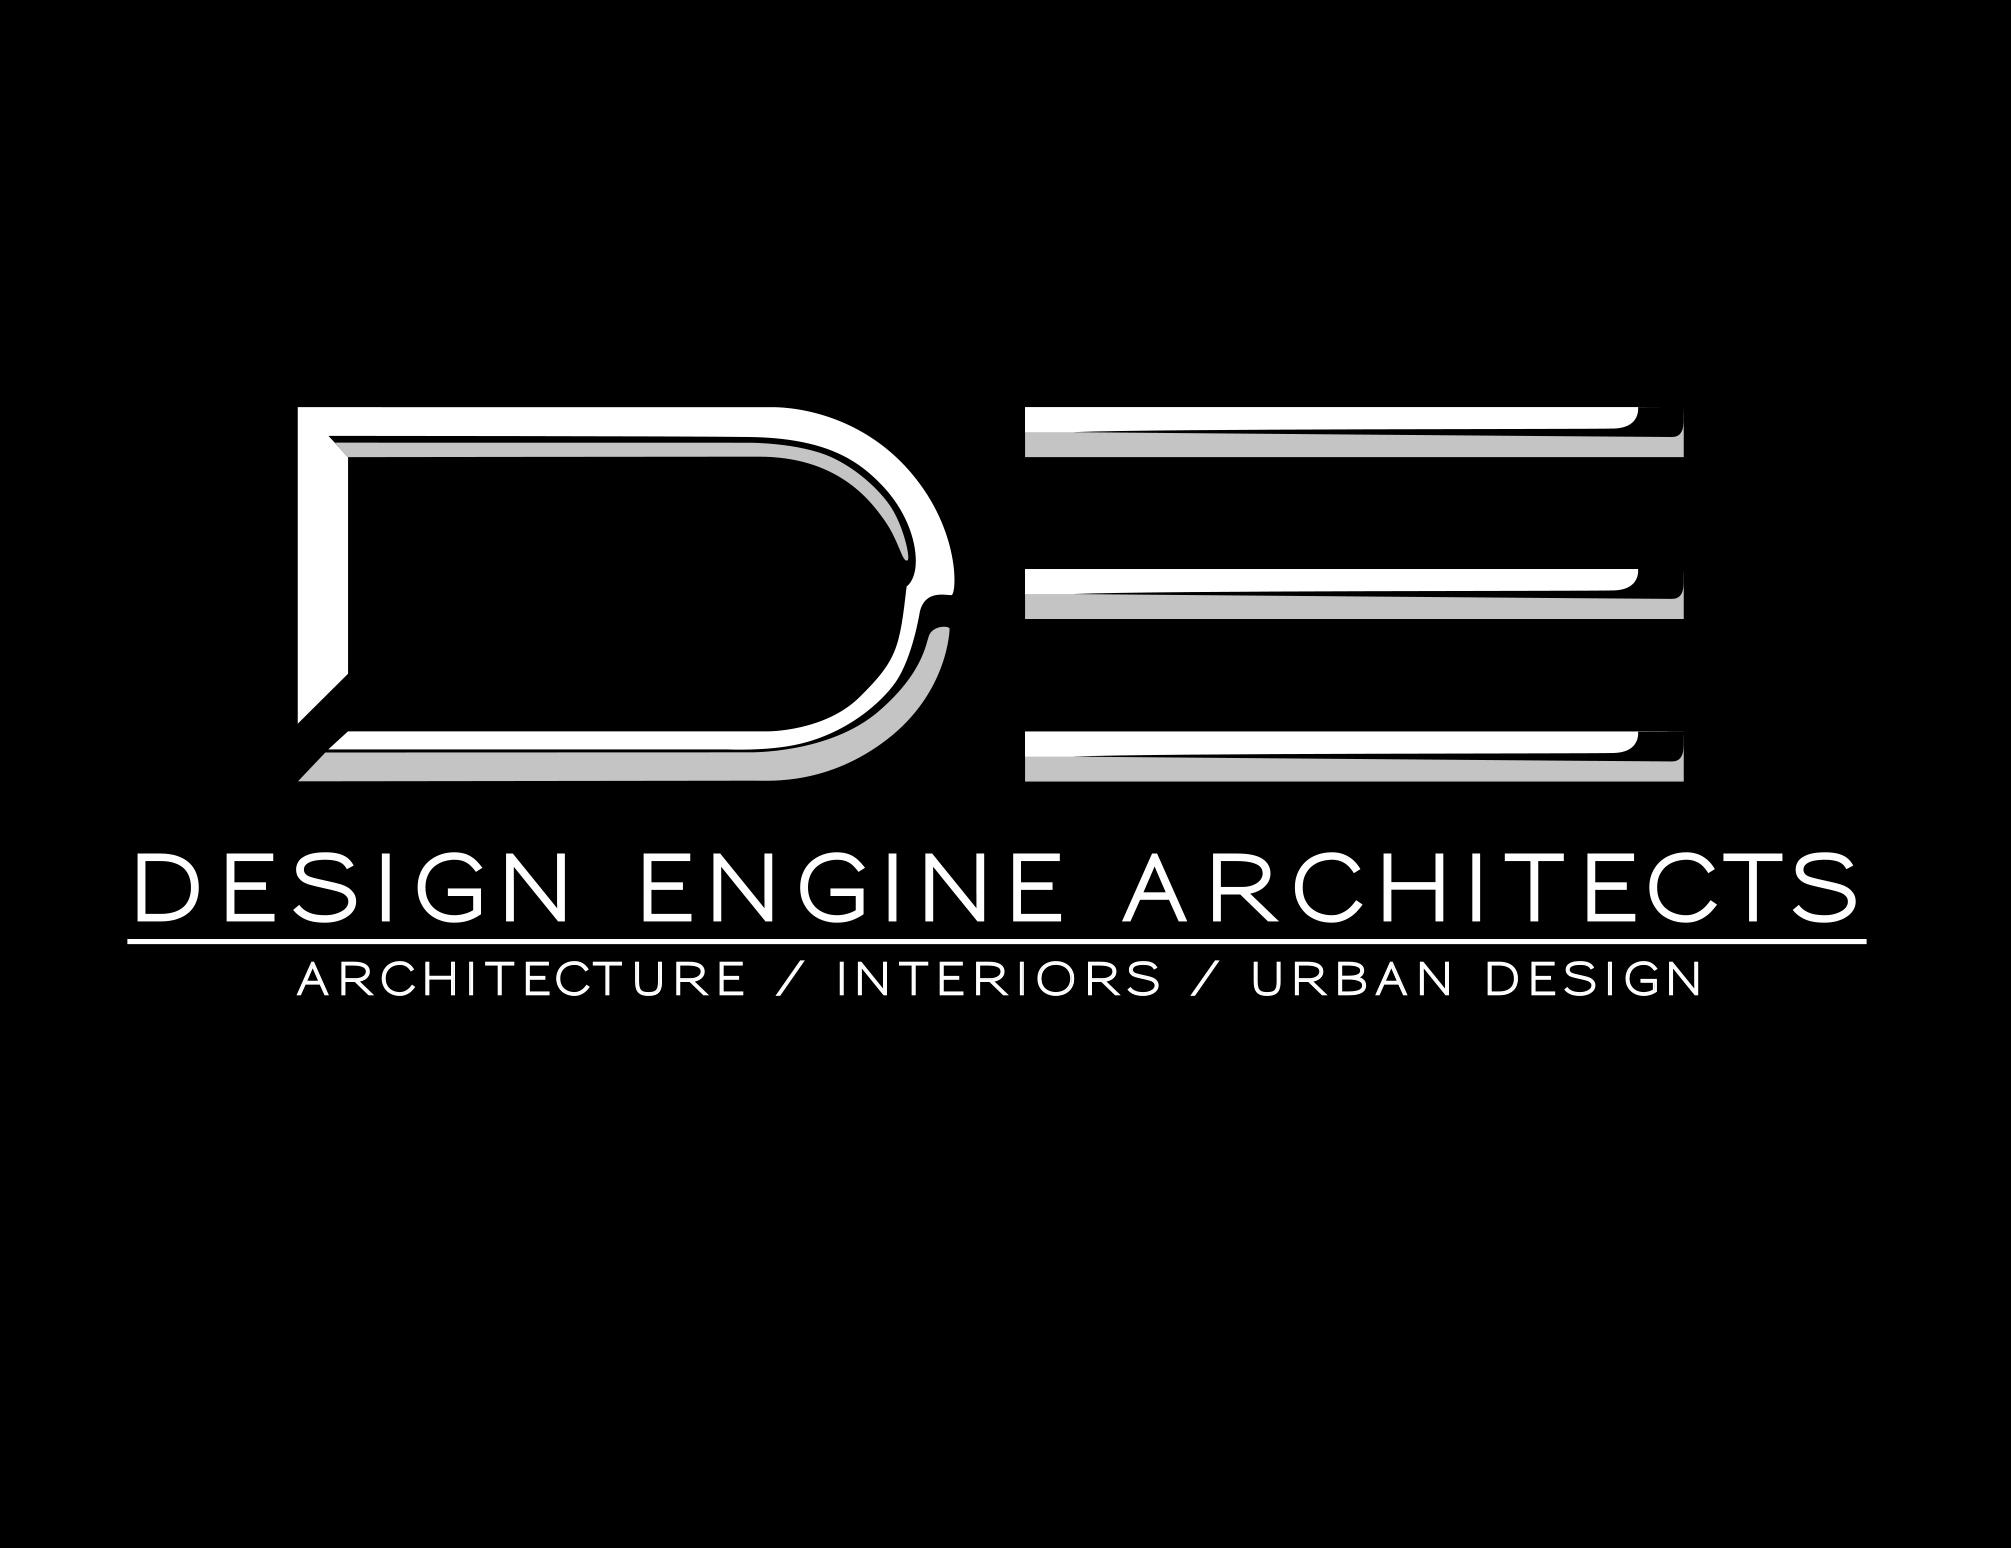 Design Engine Architects